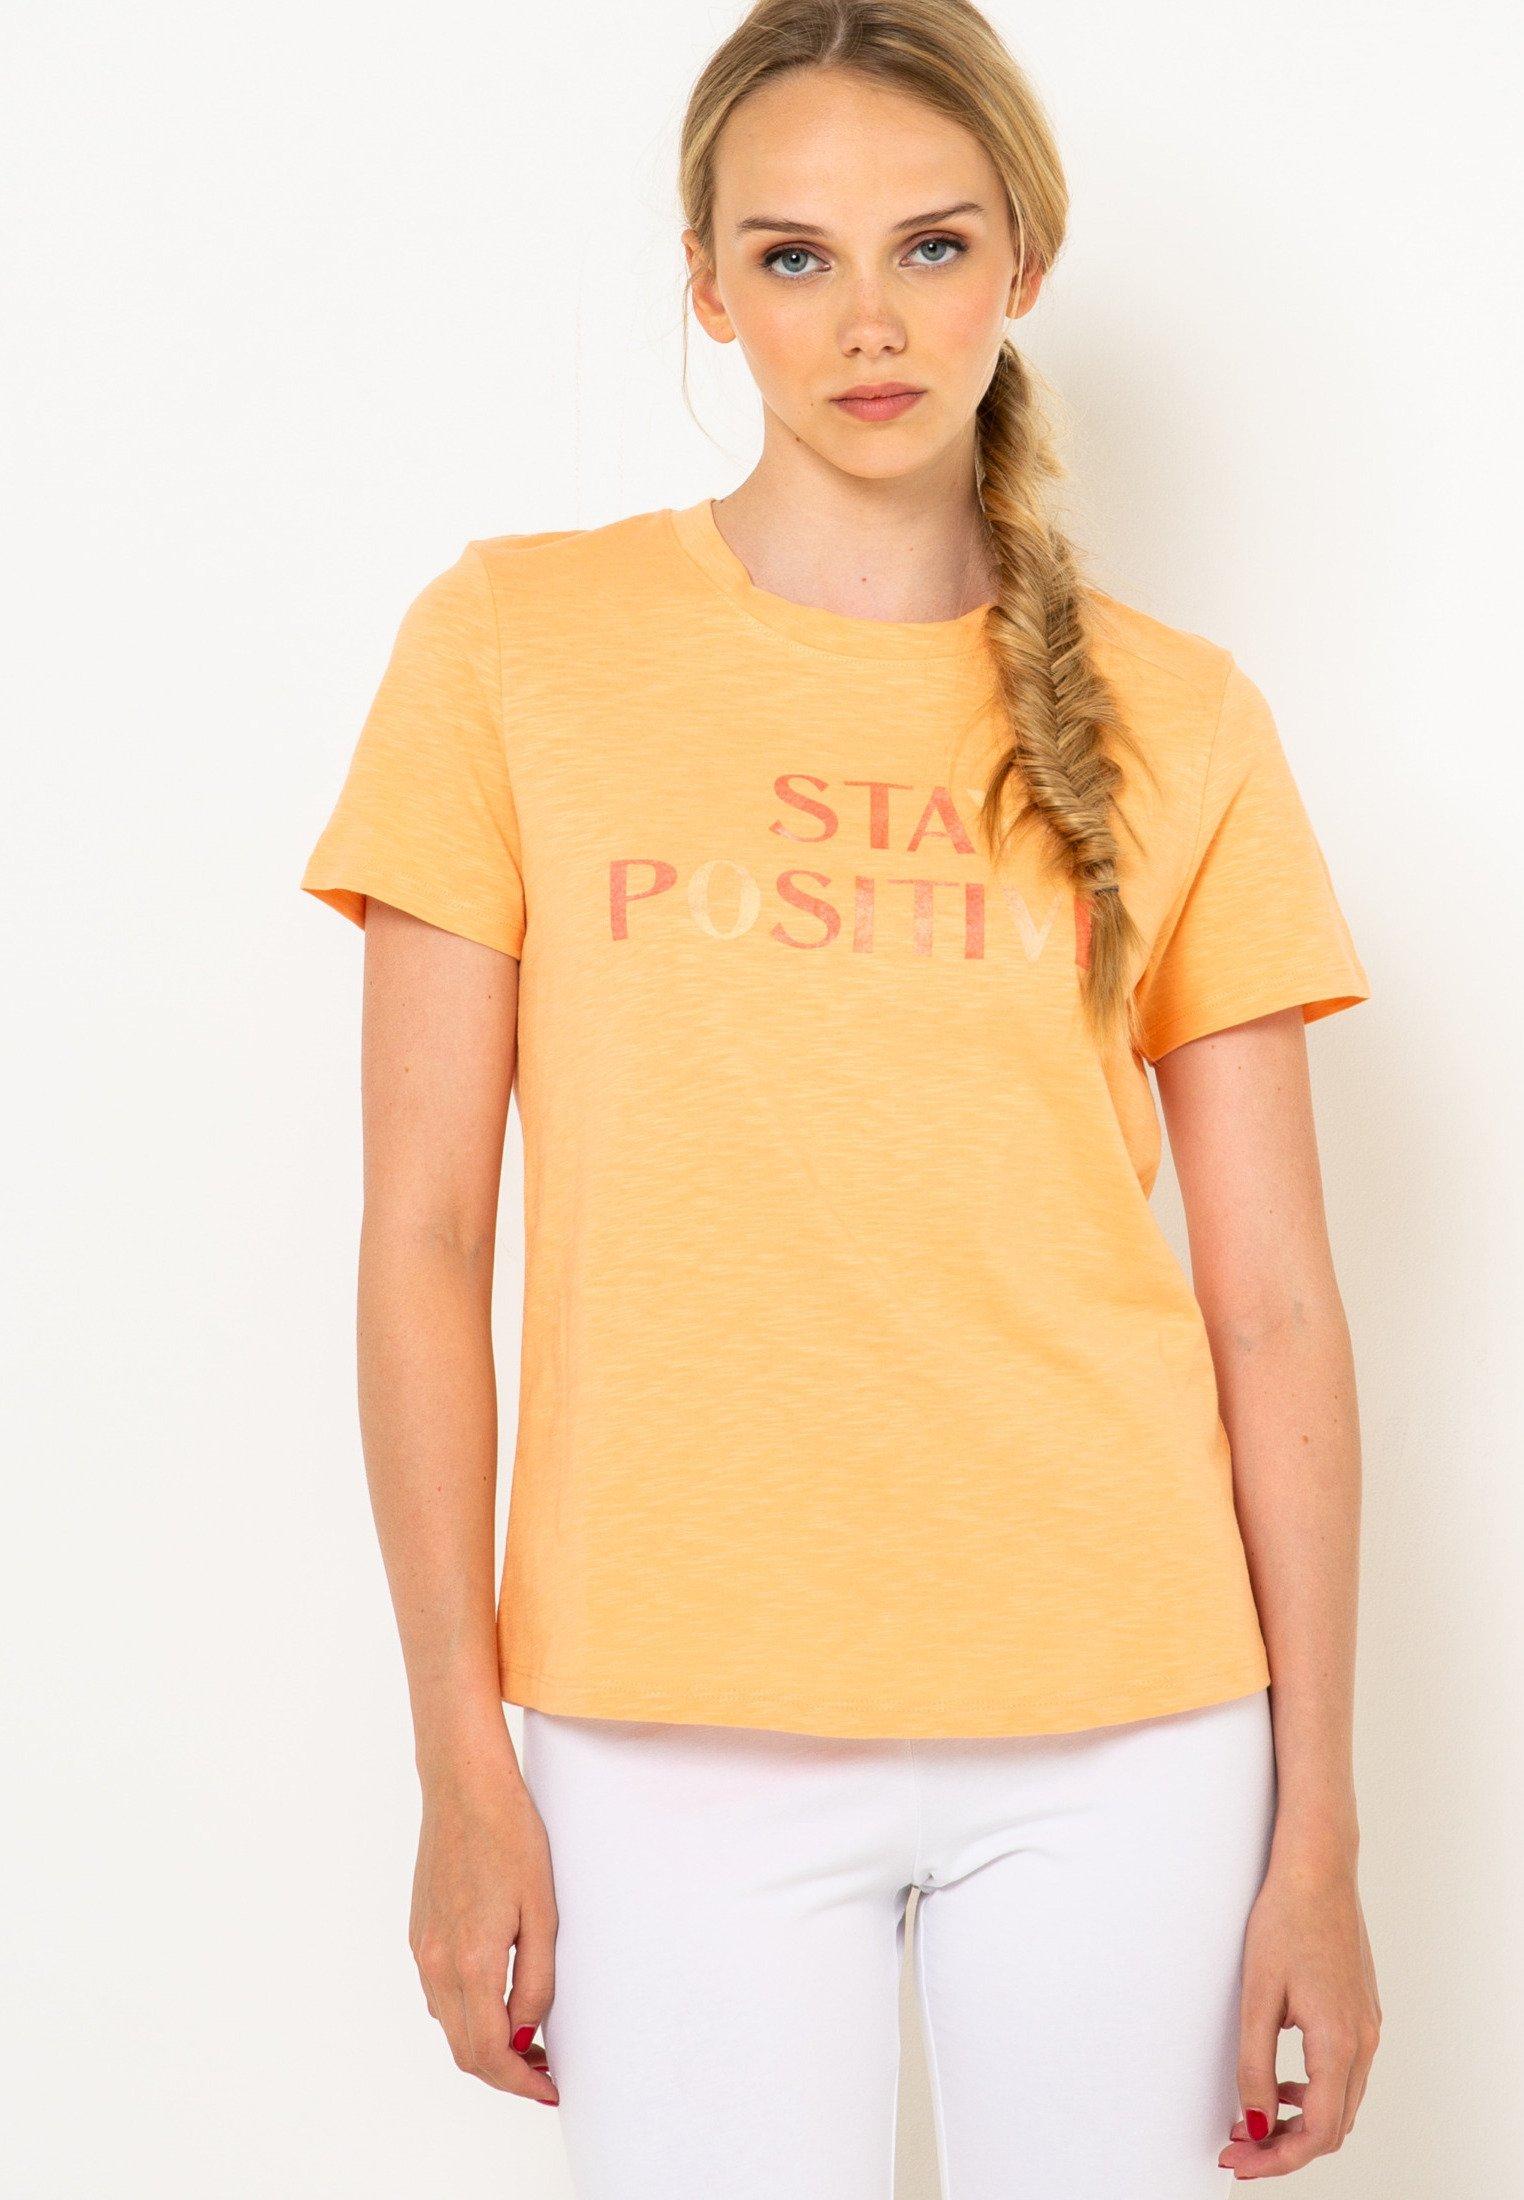 Femme SMILE IS MY WAY OF LIFE - T-shirt imprimé